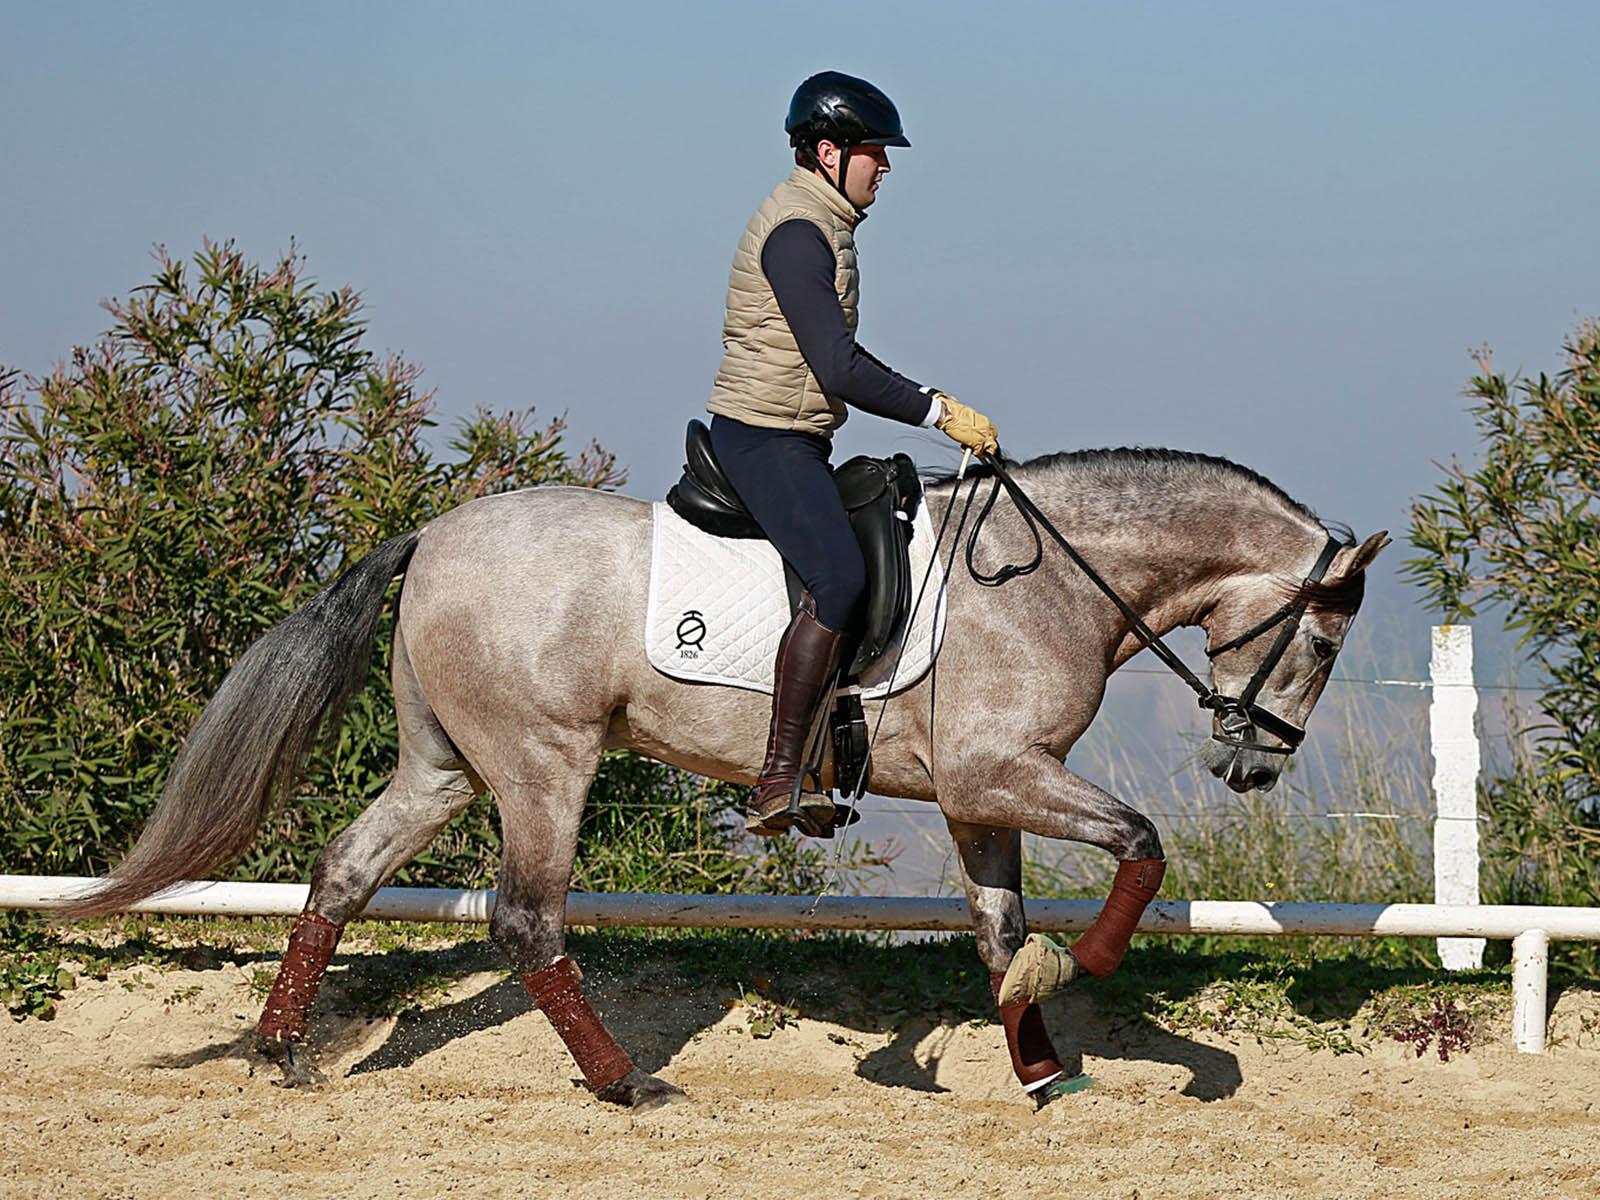 PRE-Andalusier-spanische-pferde-Passion-Barock